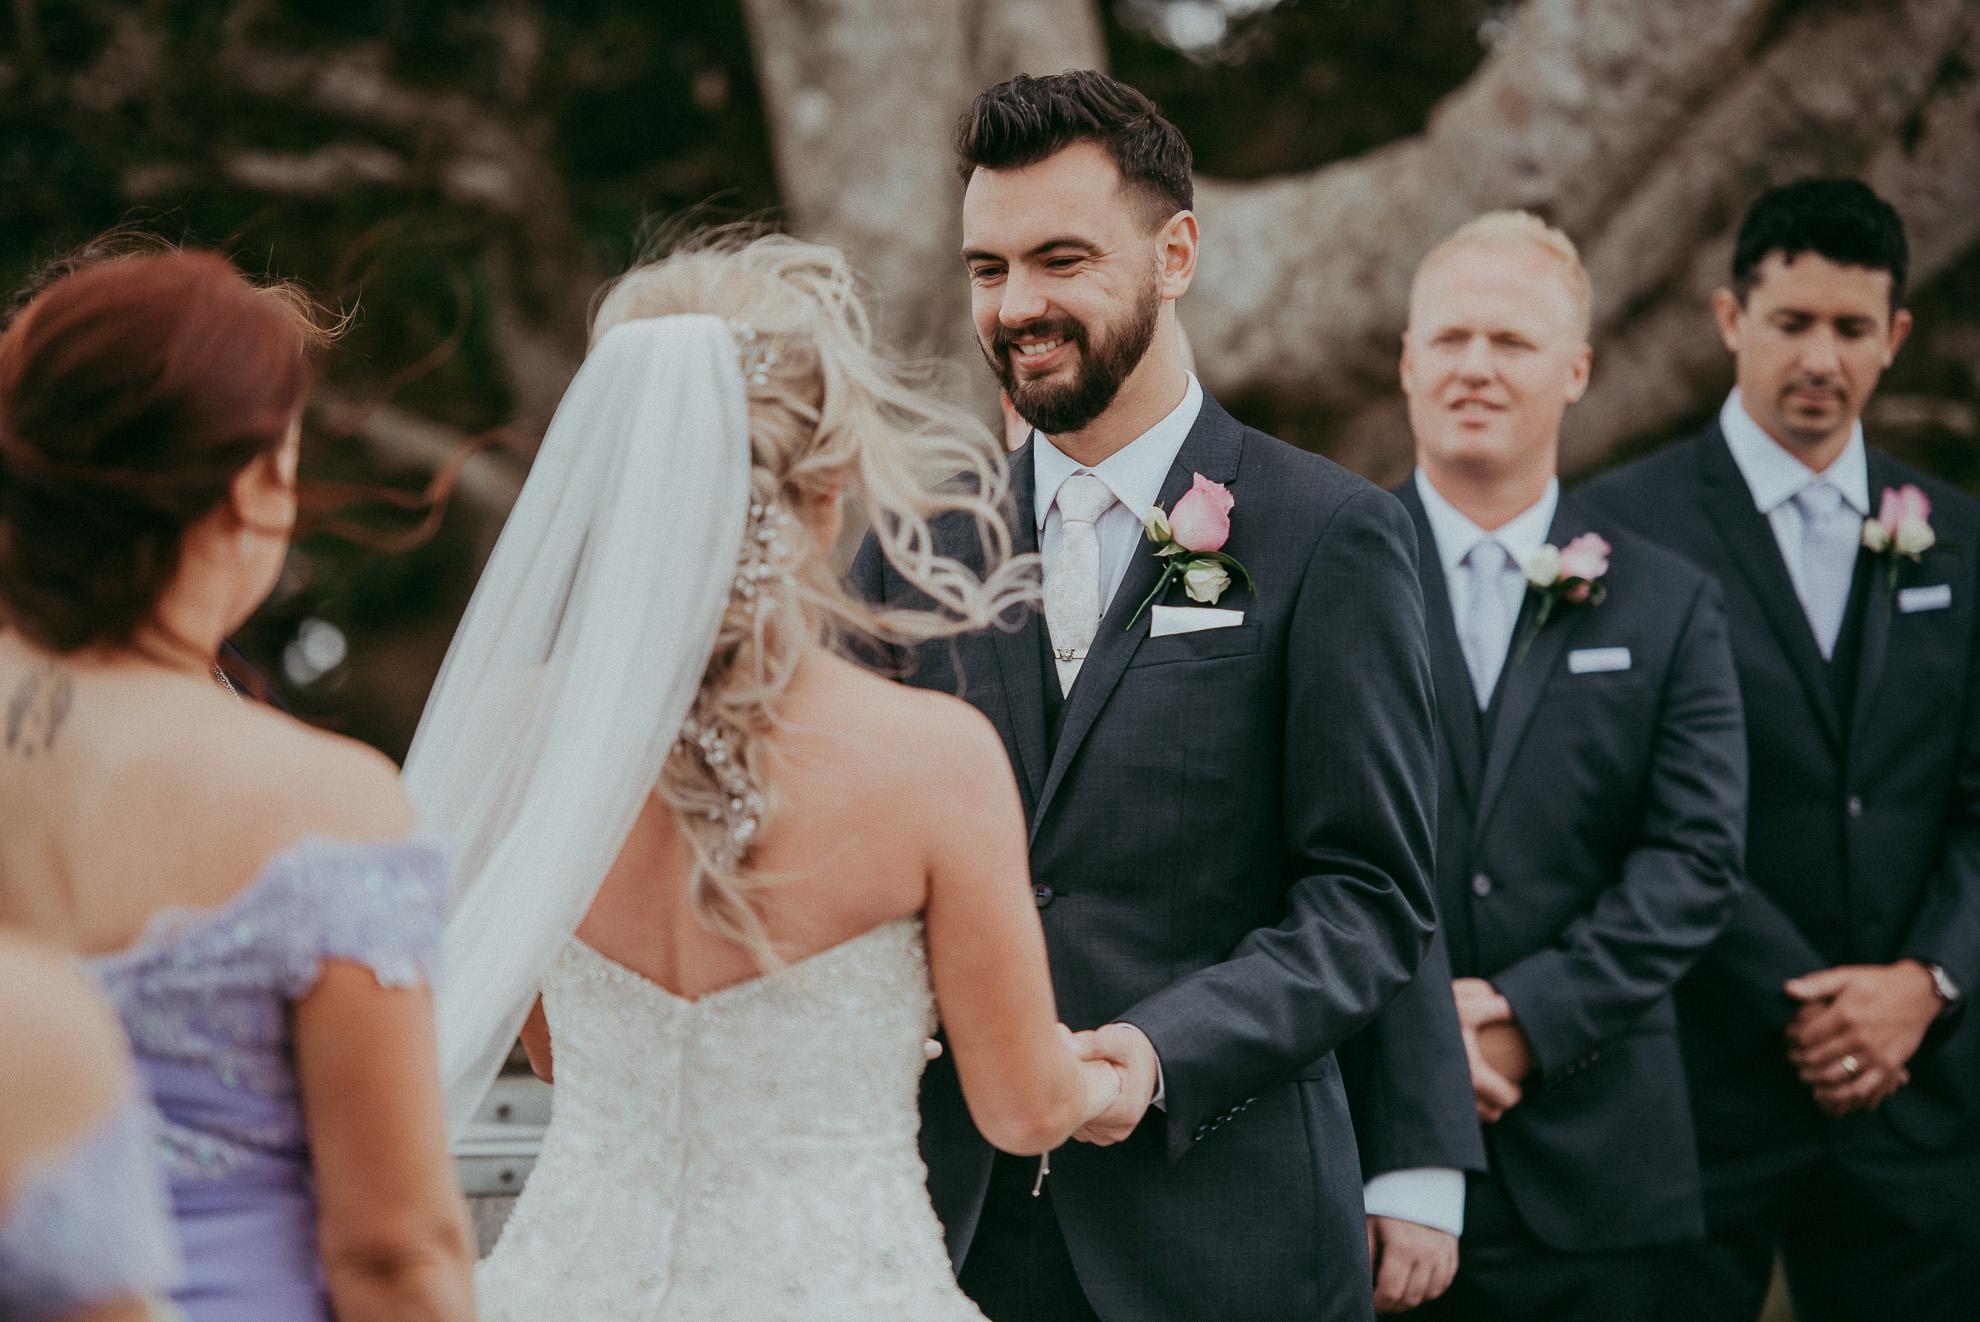 wedding-by-levien-330.JPG